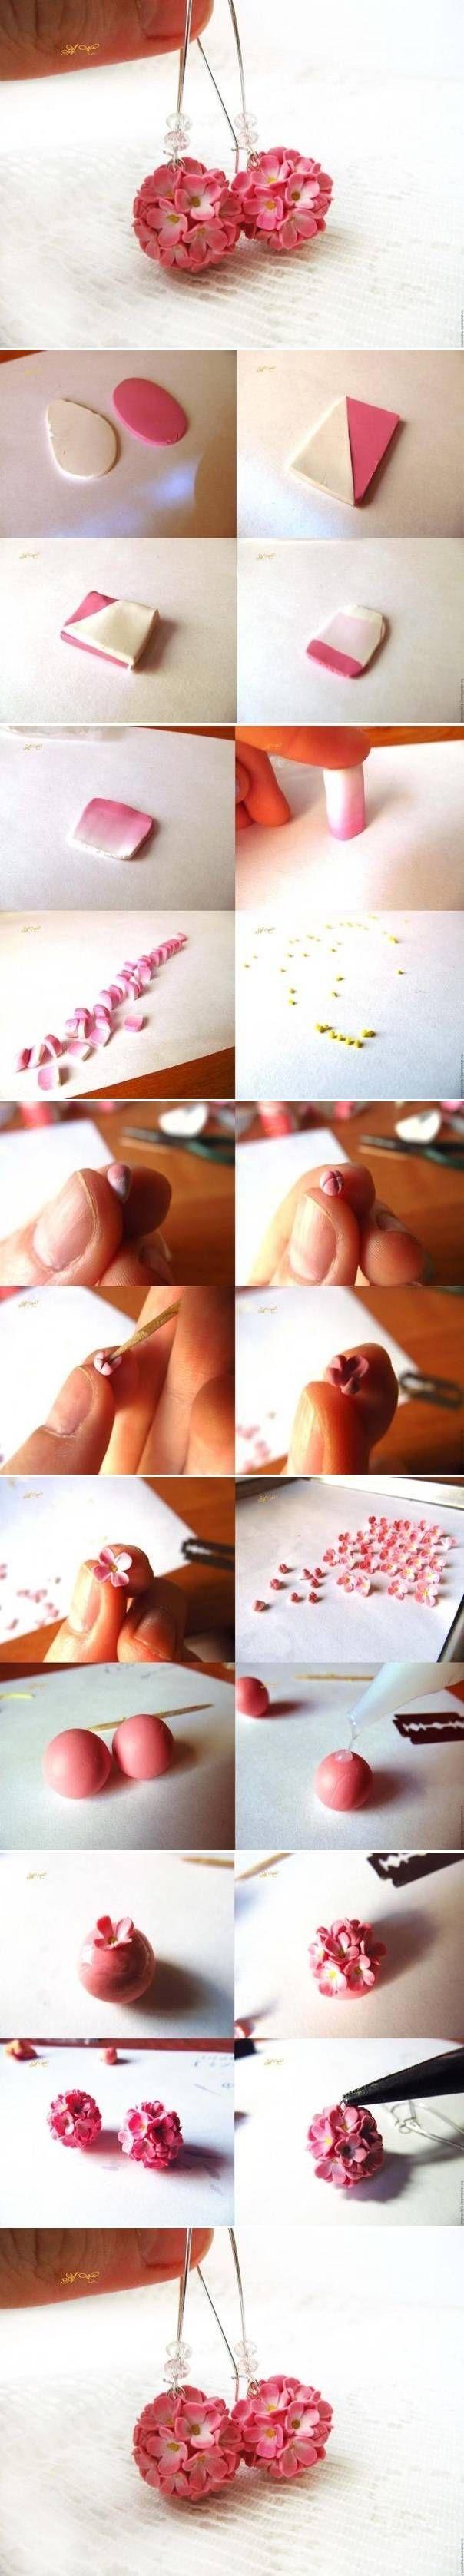 DIY Delicate Flower Ball Earrings